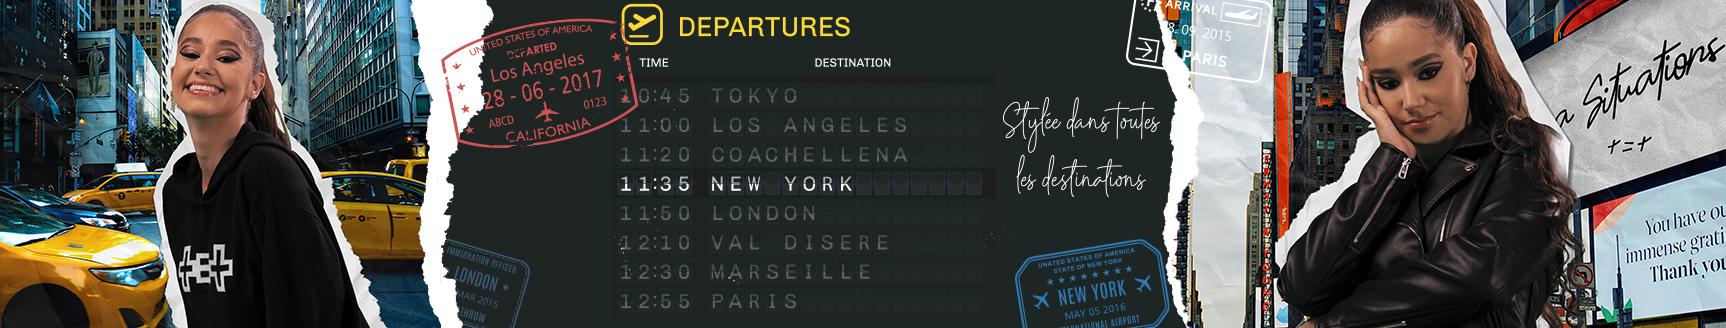 DestinationNY